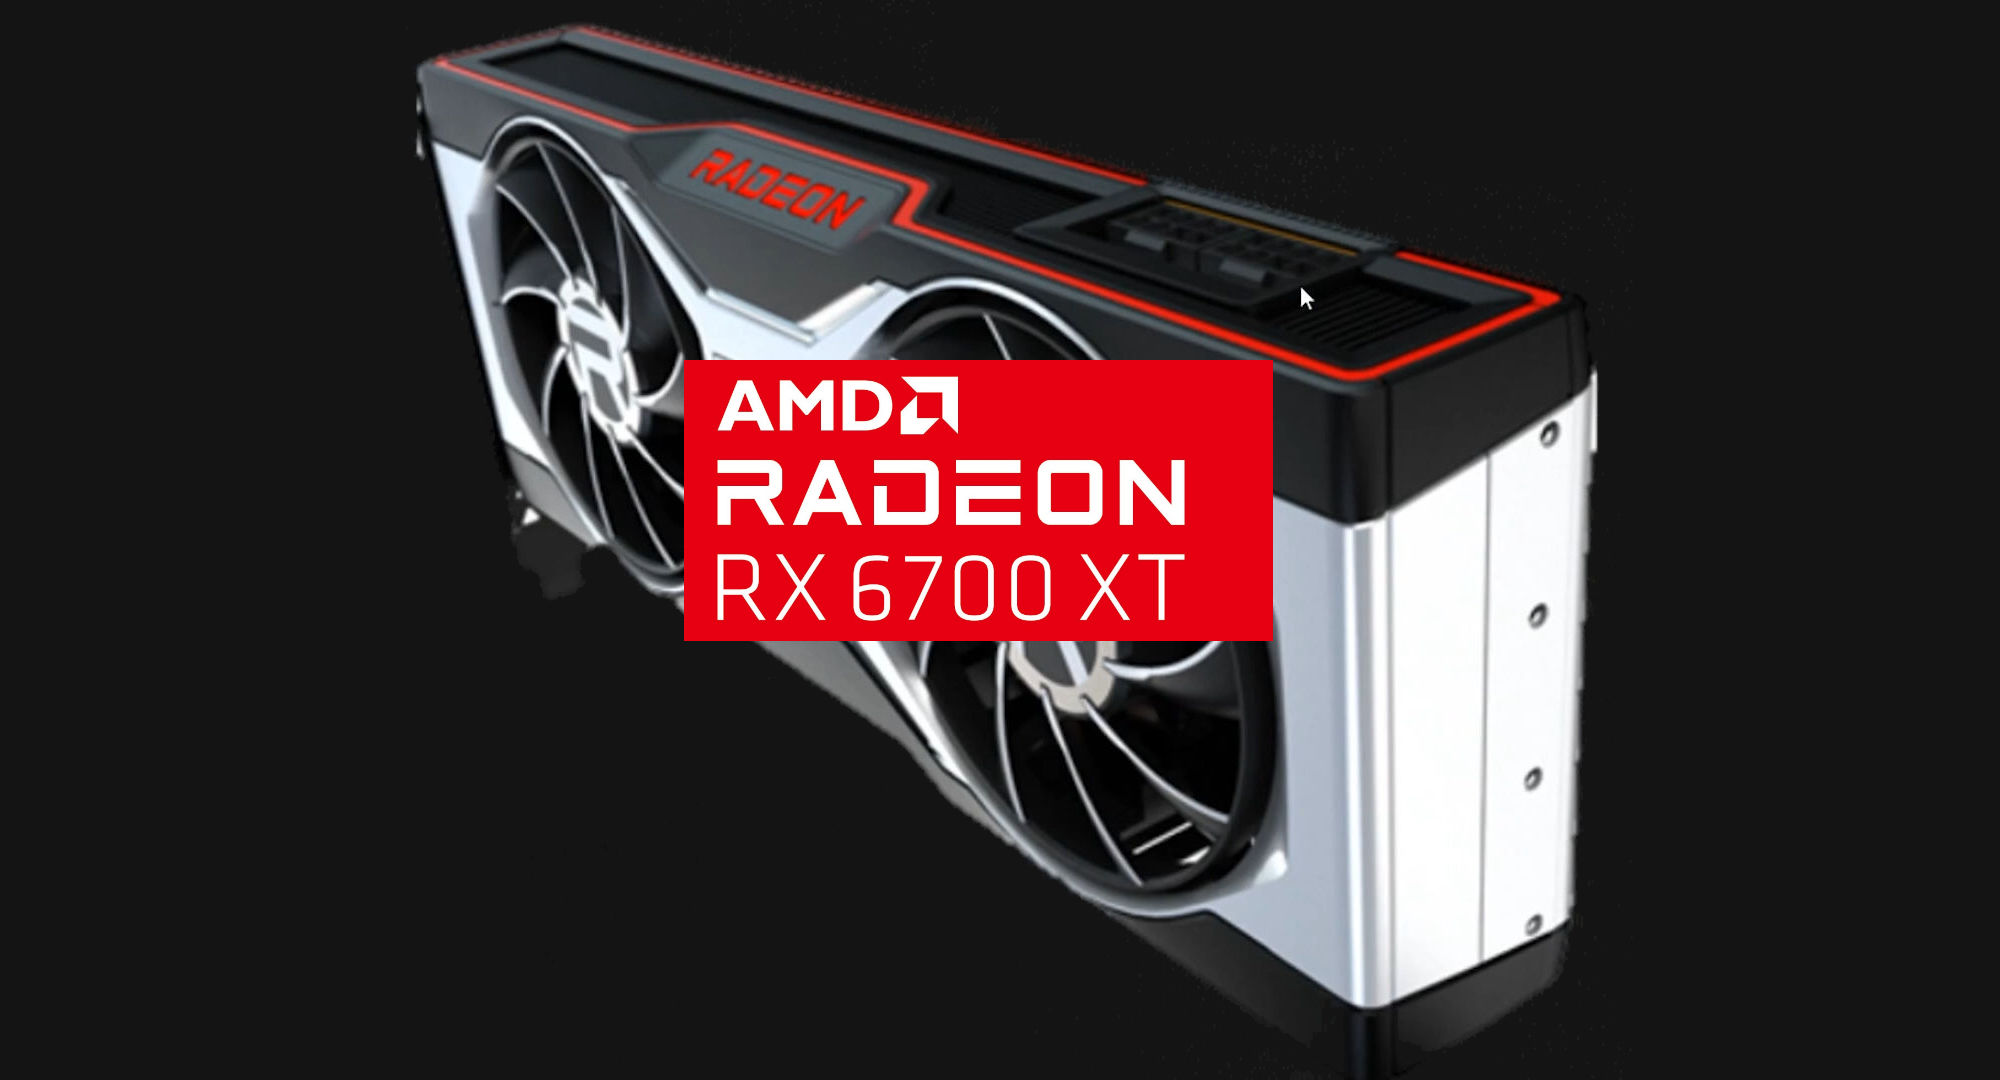 AMD Radeon RX 6700 XT teased with 12GB GDDR6 memory – VideoCardz.com